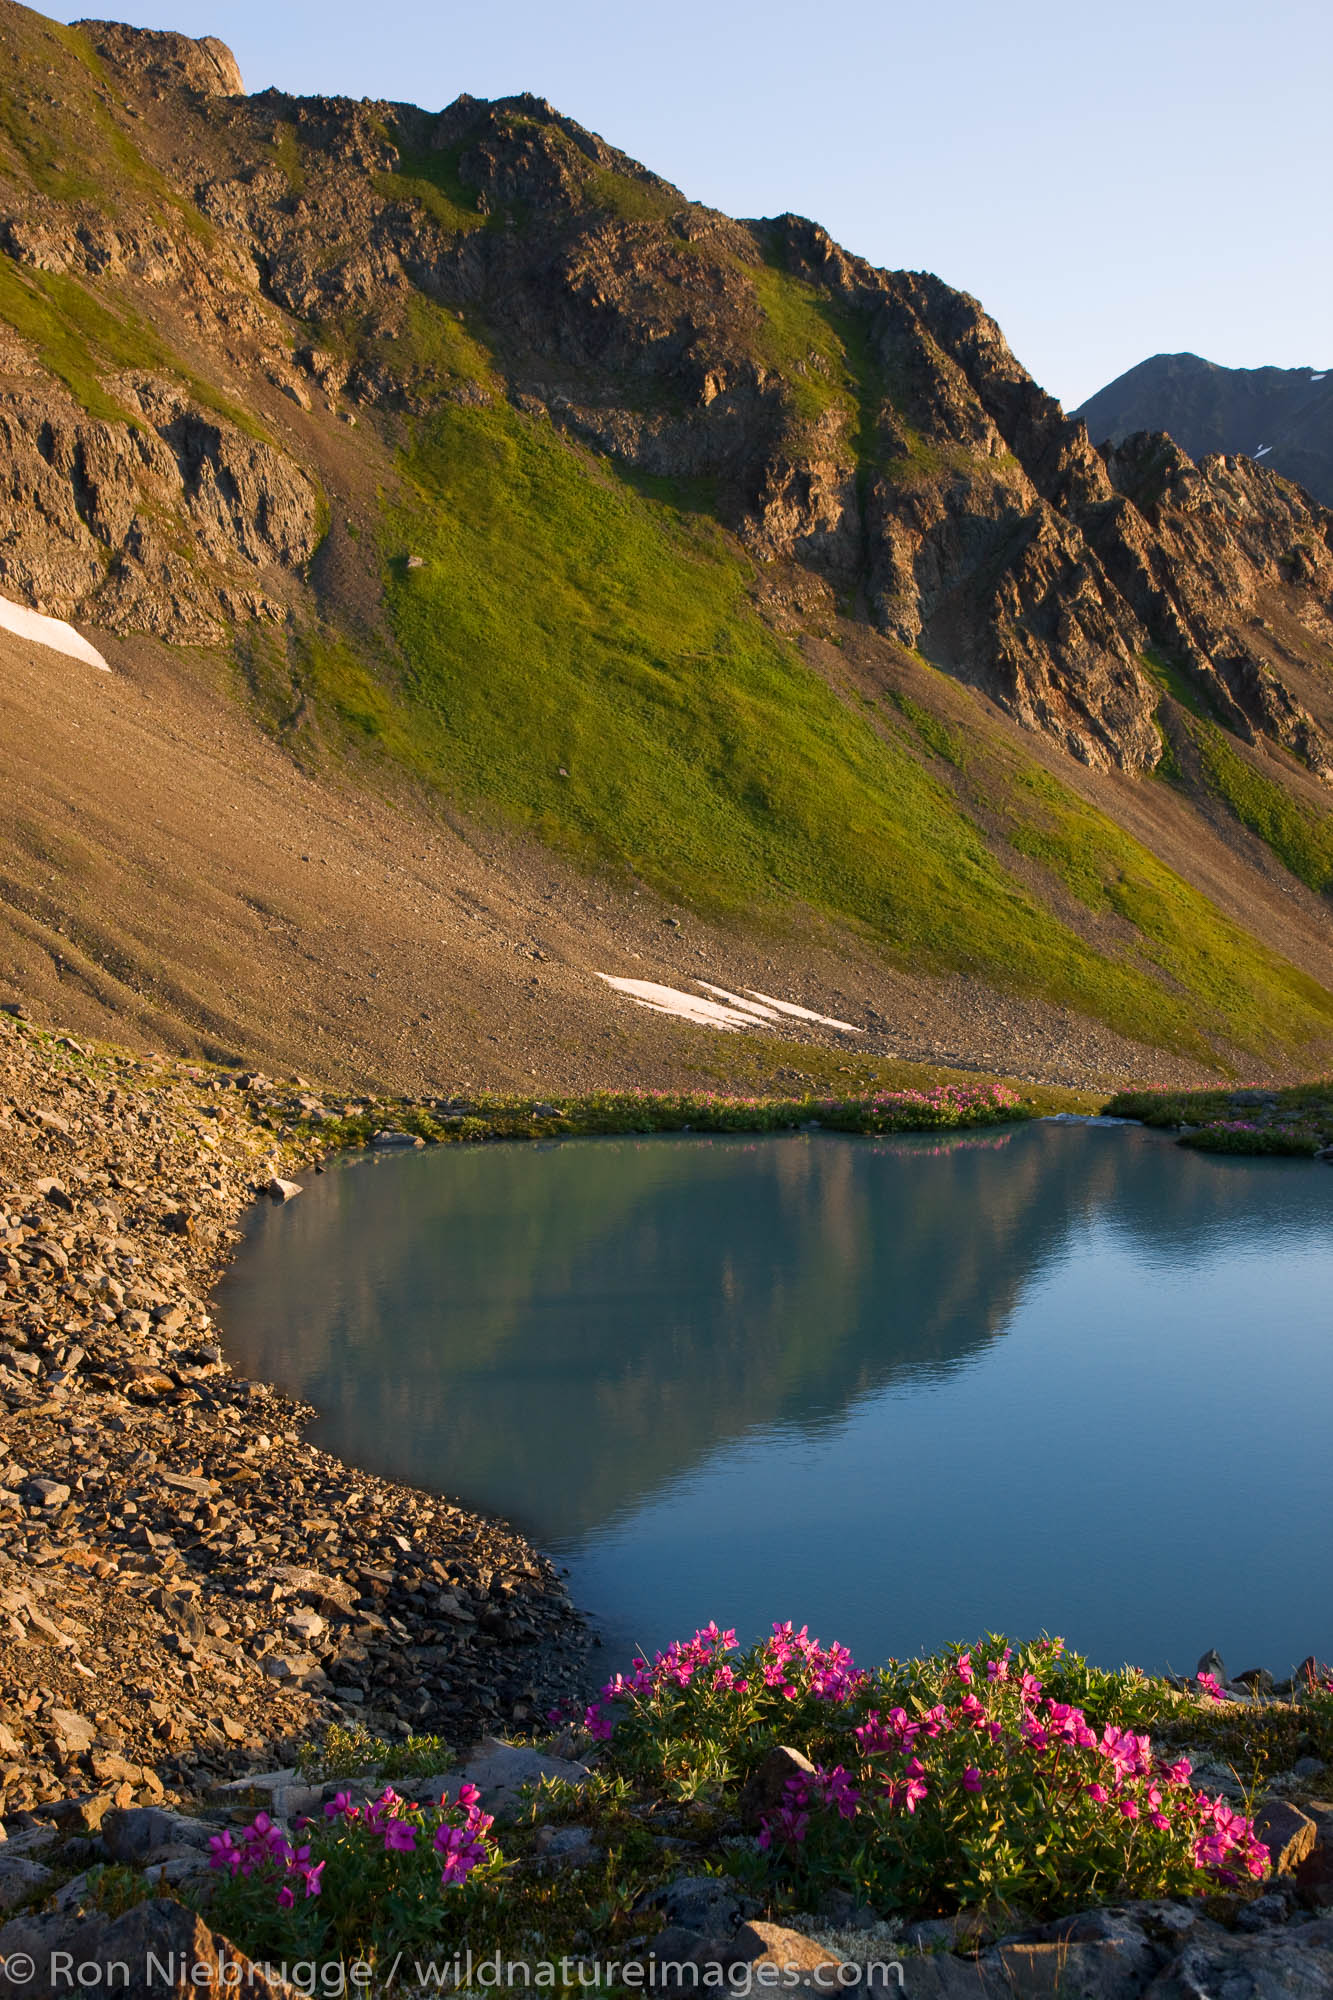 Wildflowers in the bowl area of Mt Marathon, Seward, Alaska.